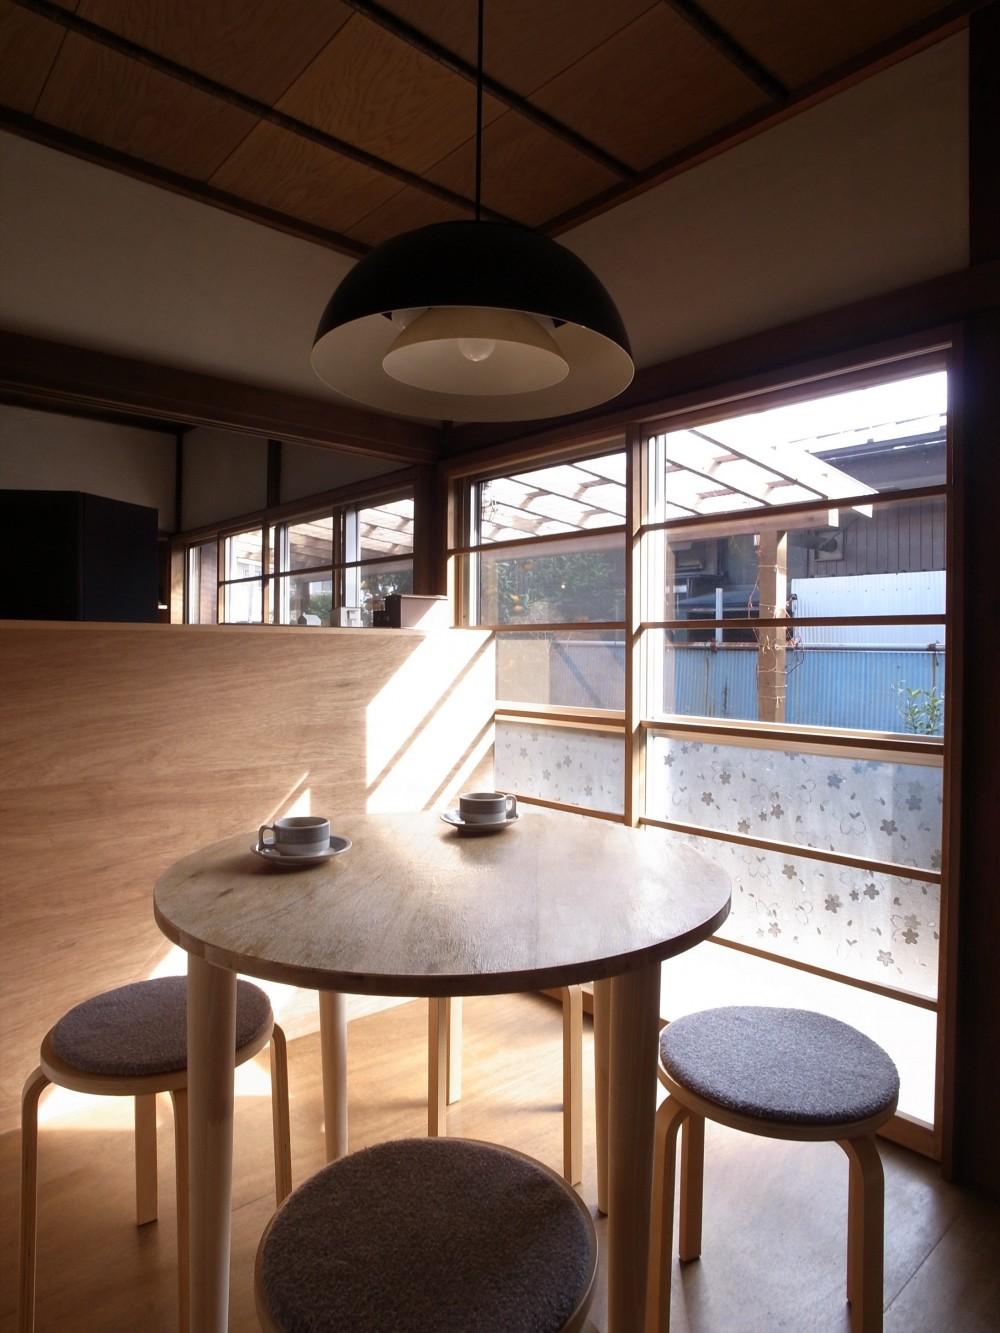 K A M O S U ・ 早田雄次郎建築設計事務所 (事務所打合せスペース)